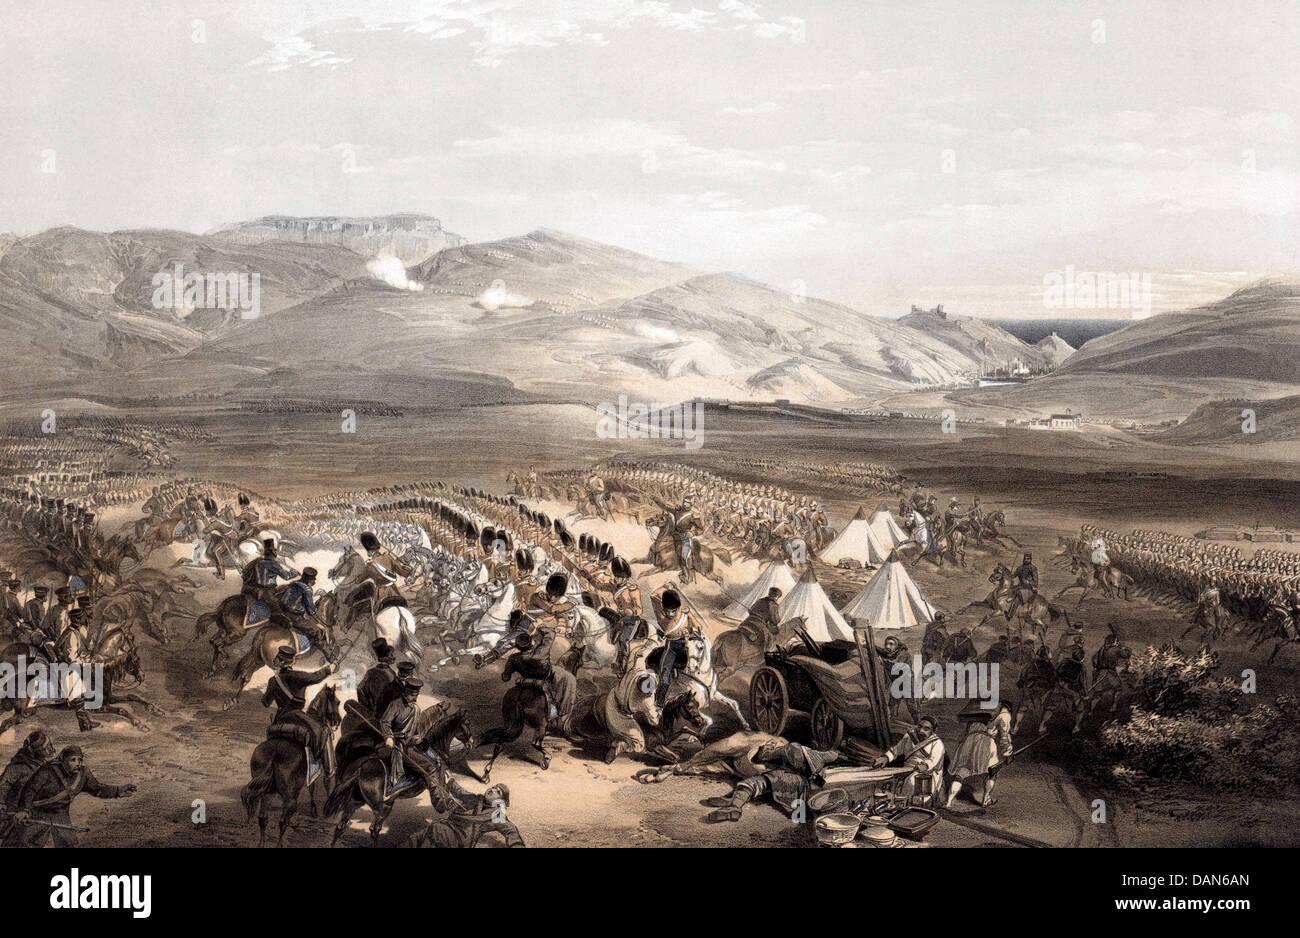 CRIMEAN WAR: BATTLE OF BALAKLAVA 25 October 1854. See Description below - Stock Image